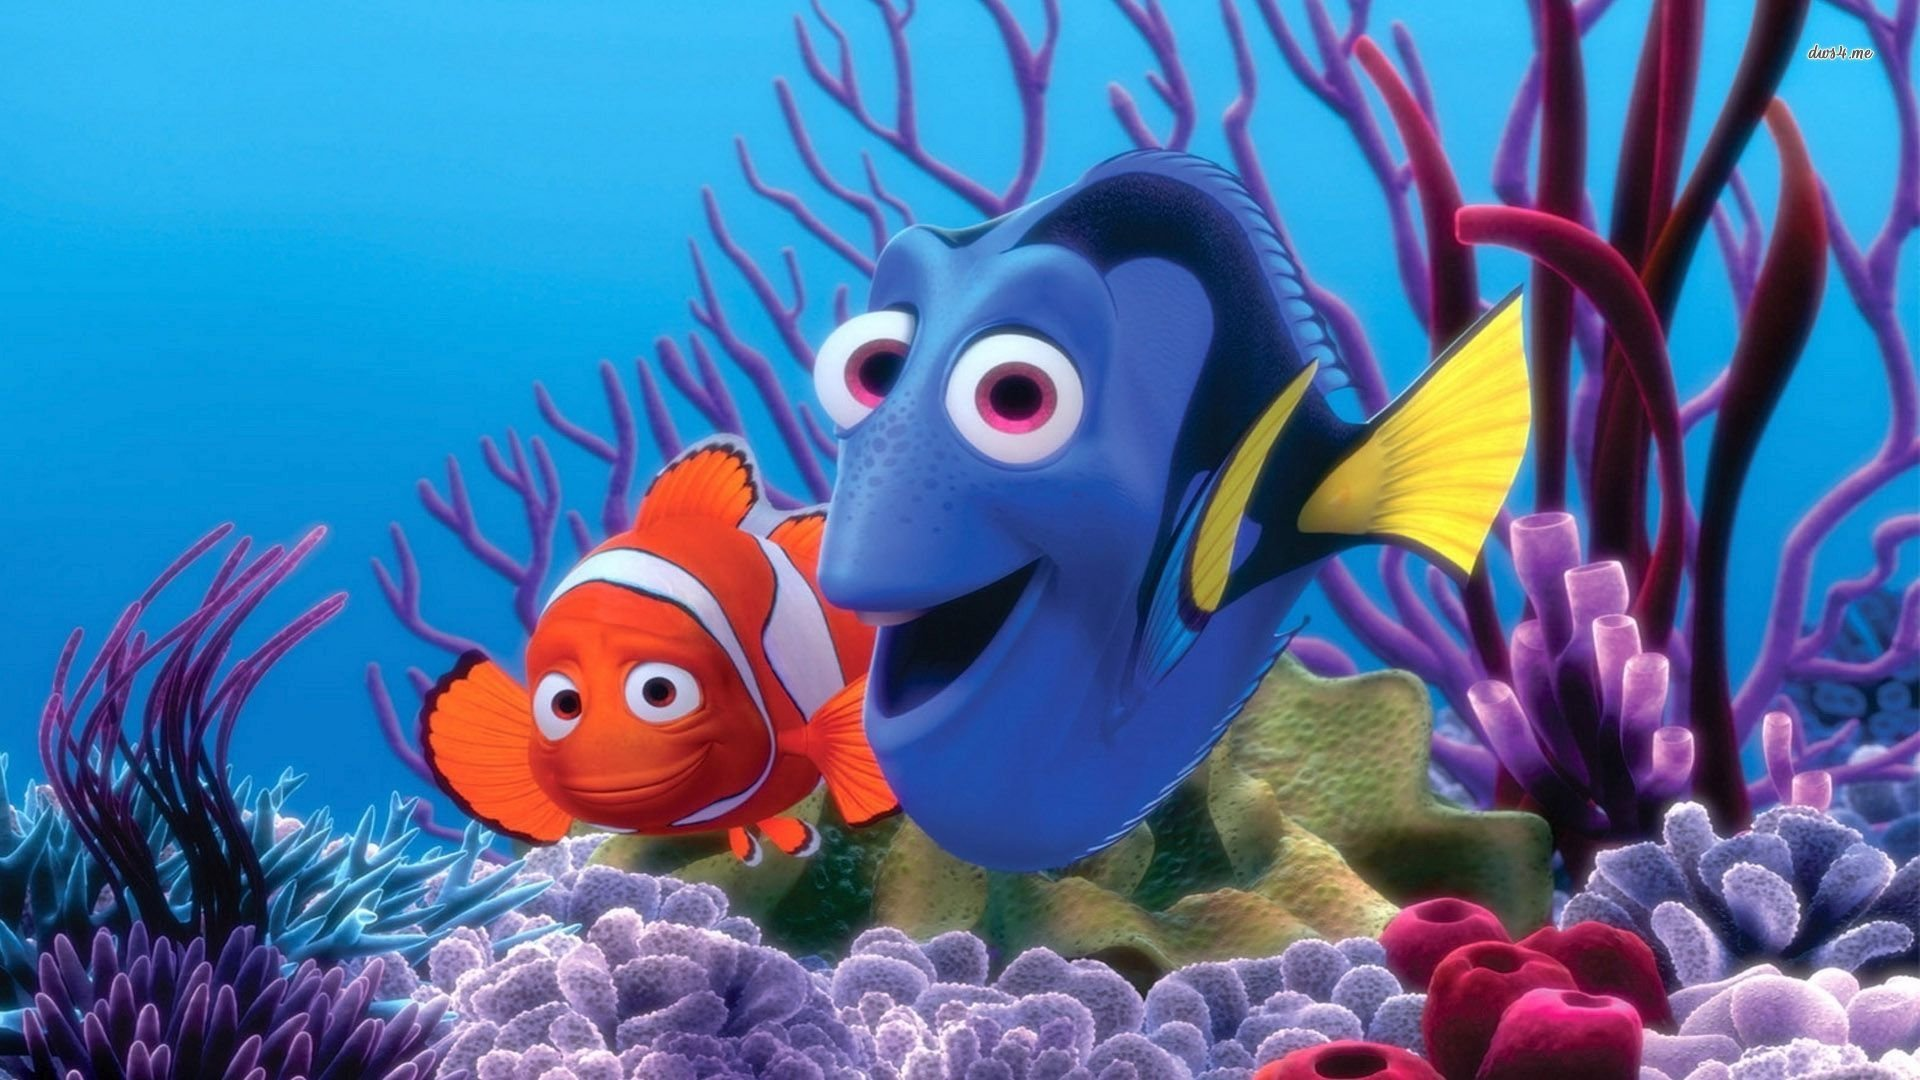 Finding Nemo D Animasi Hd Wallpaper: Le Monde De Nemo Fond D'écran HD